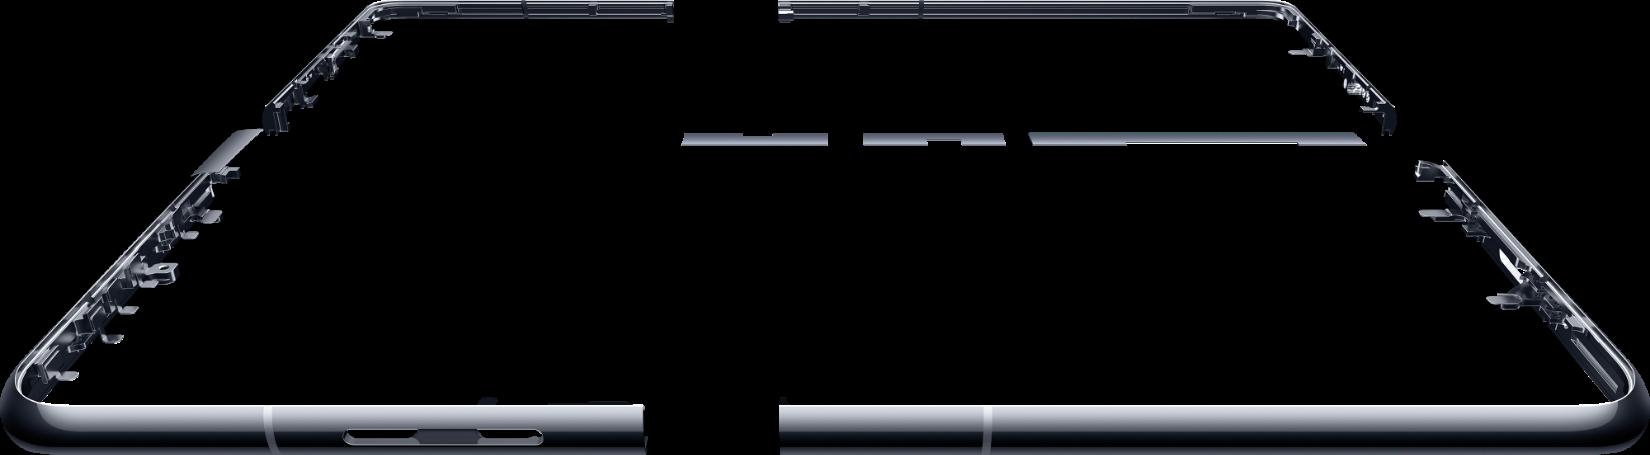 HUAWEI Mate X2 Smart Antenna System